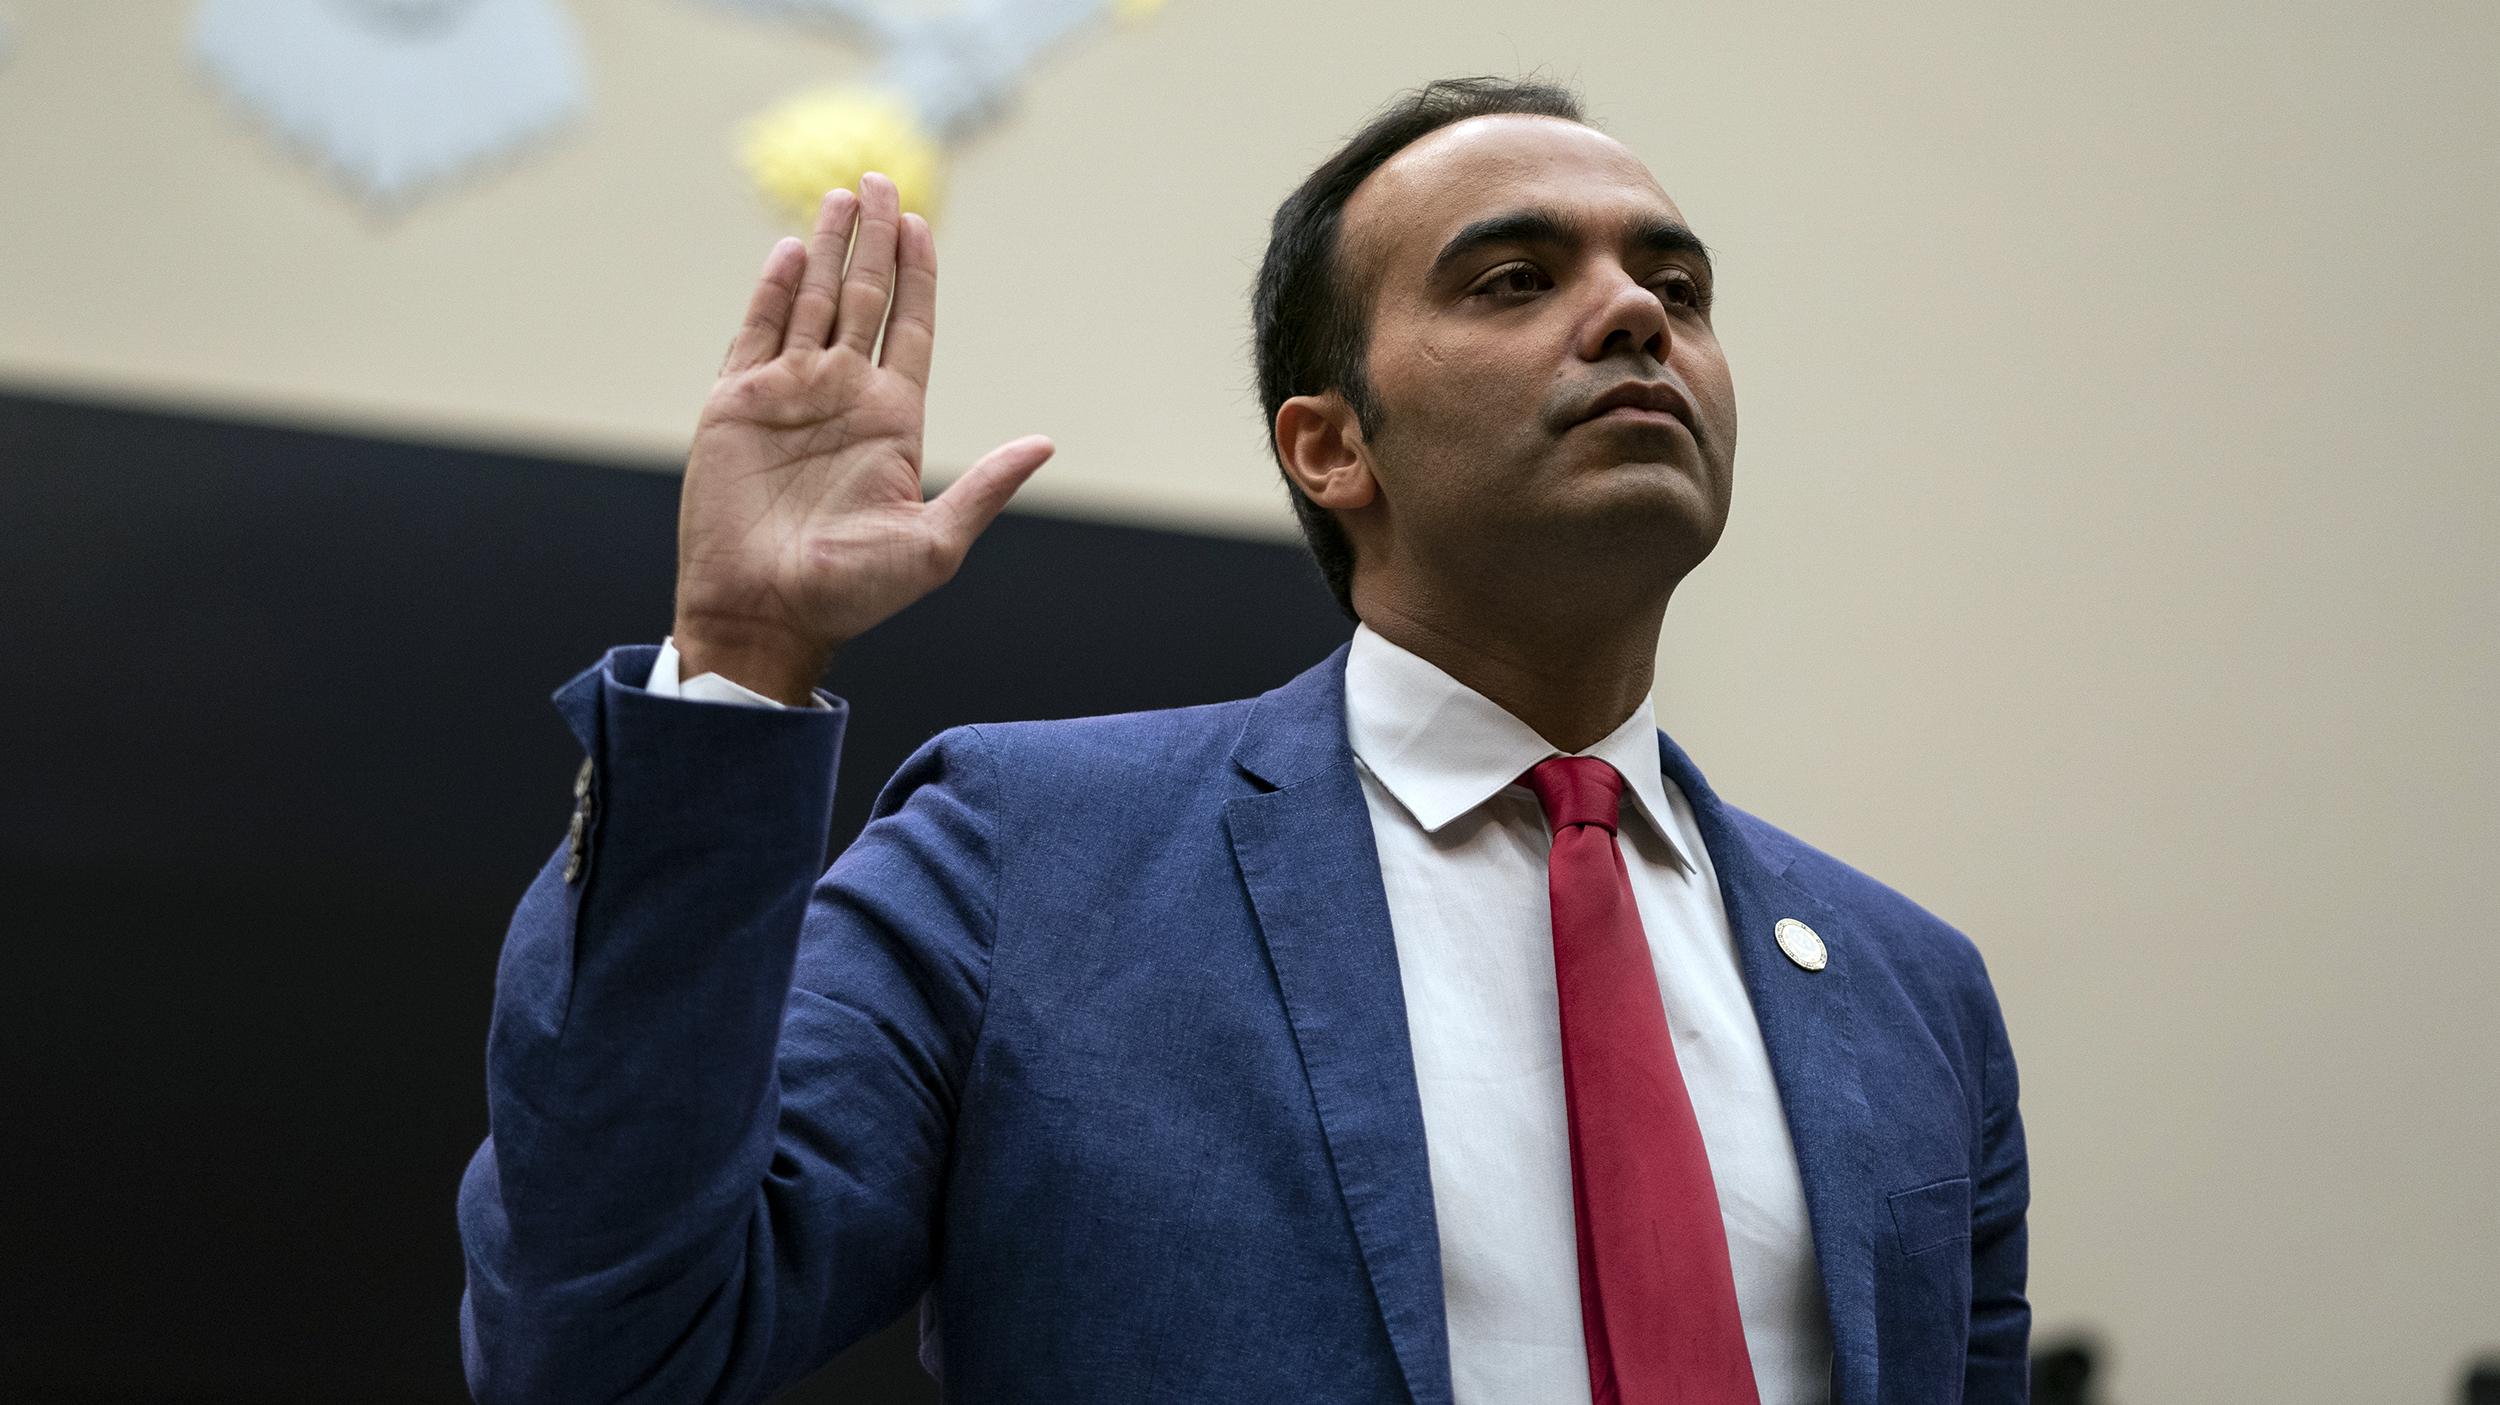 Biden's CFPB nominee Rohit Chopra brings 'substantive' regulatory expertise